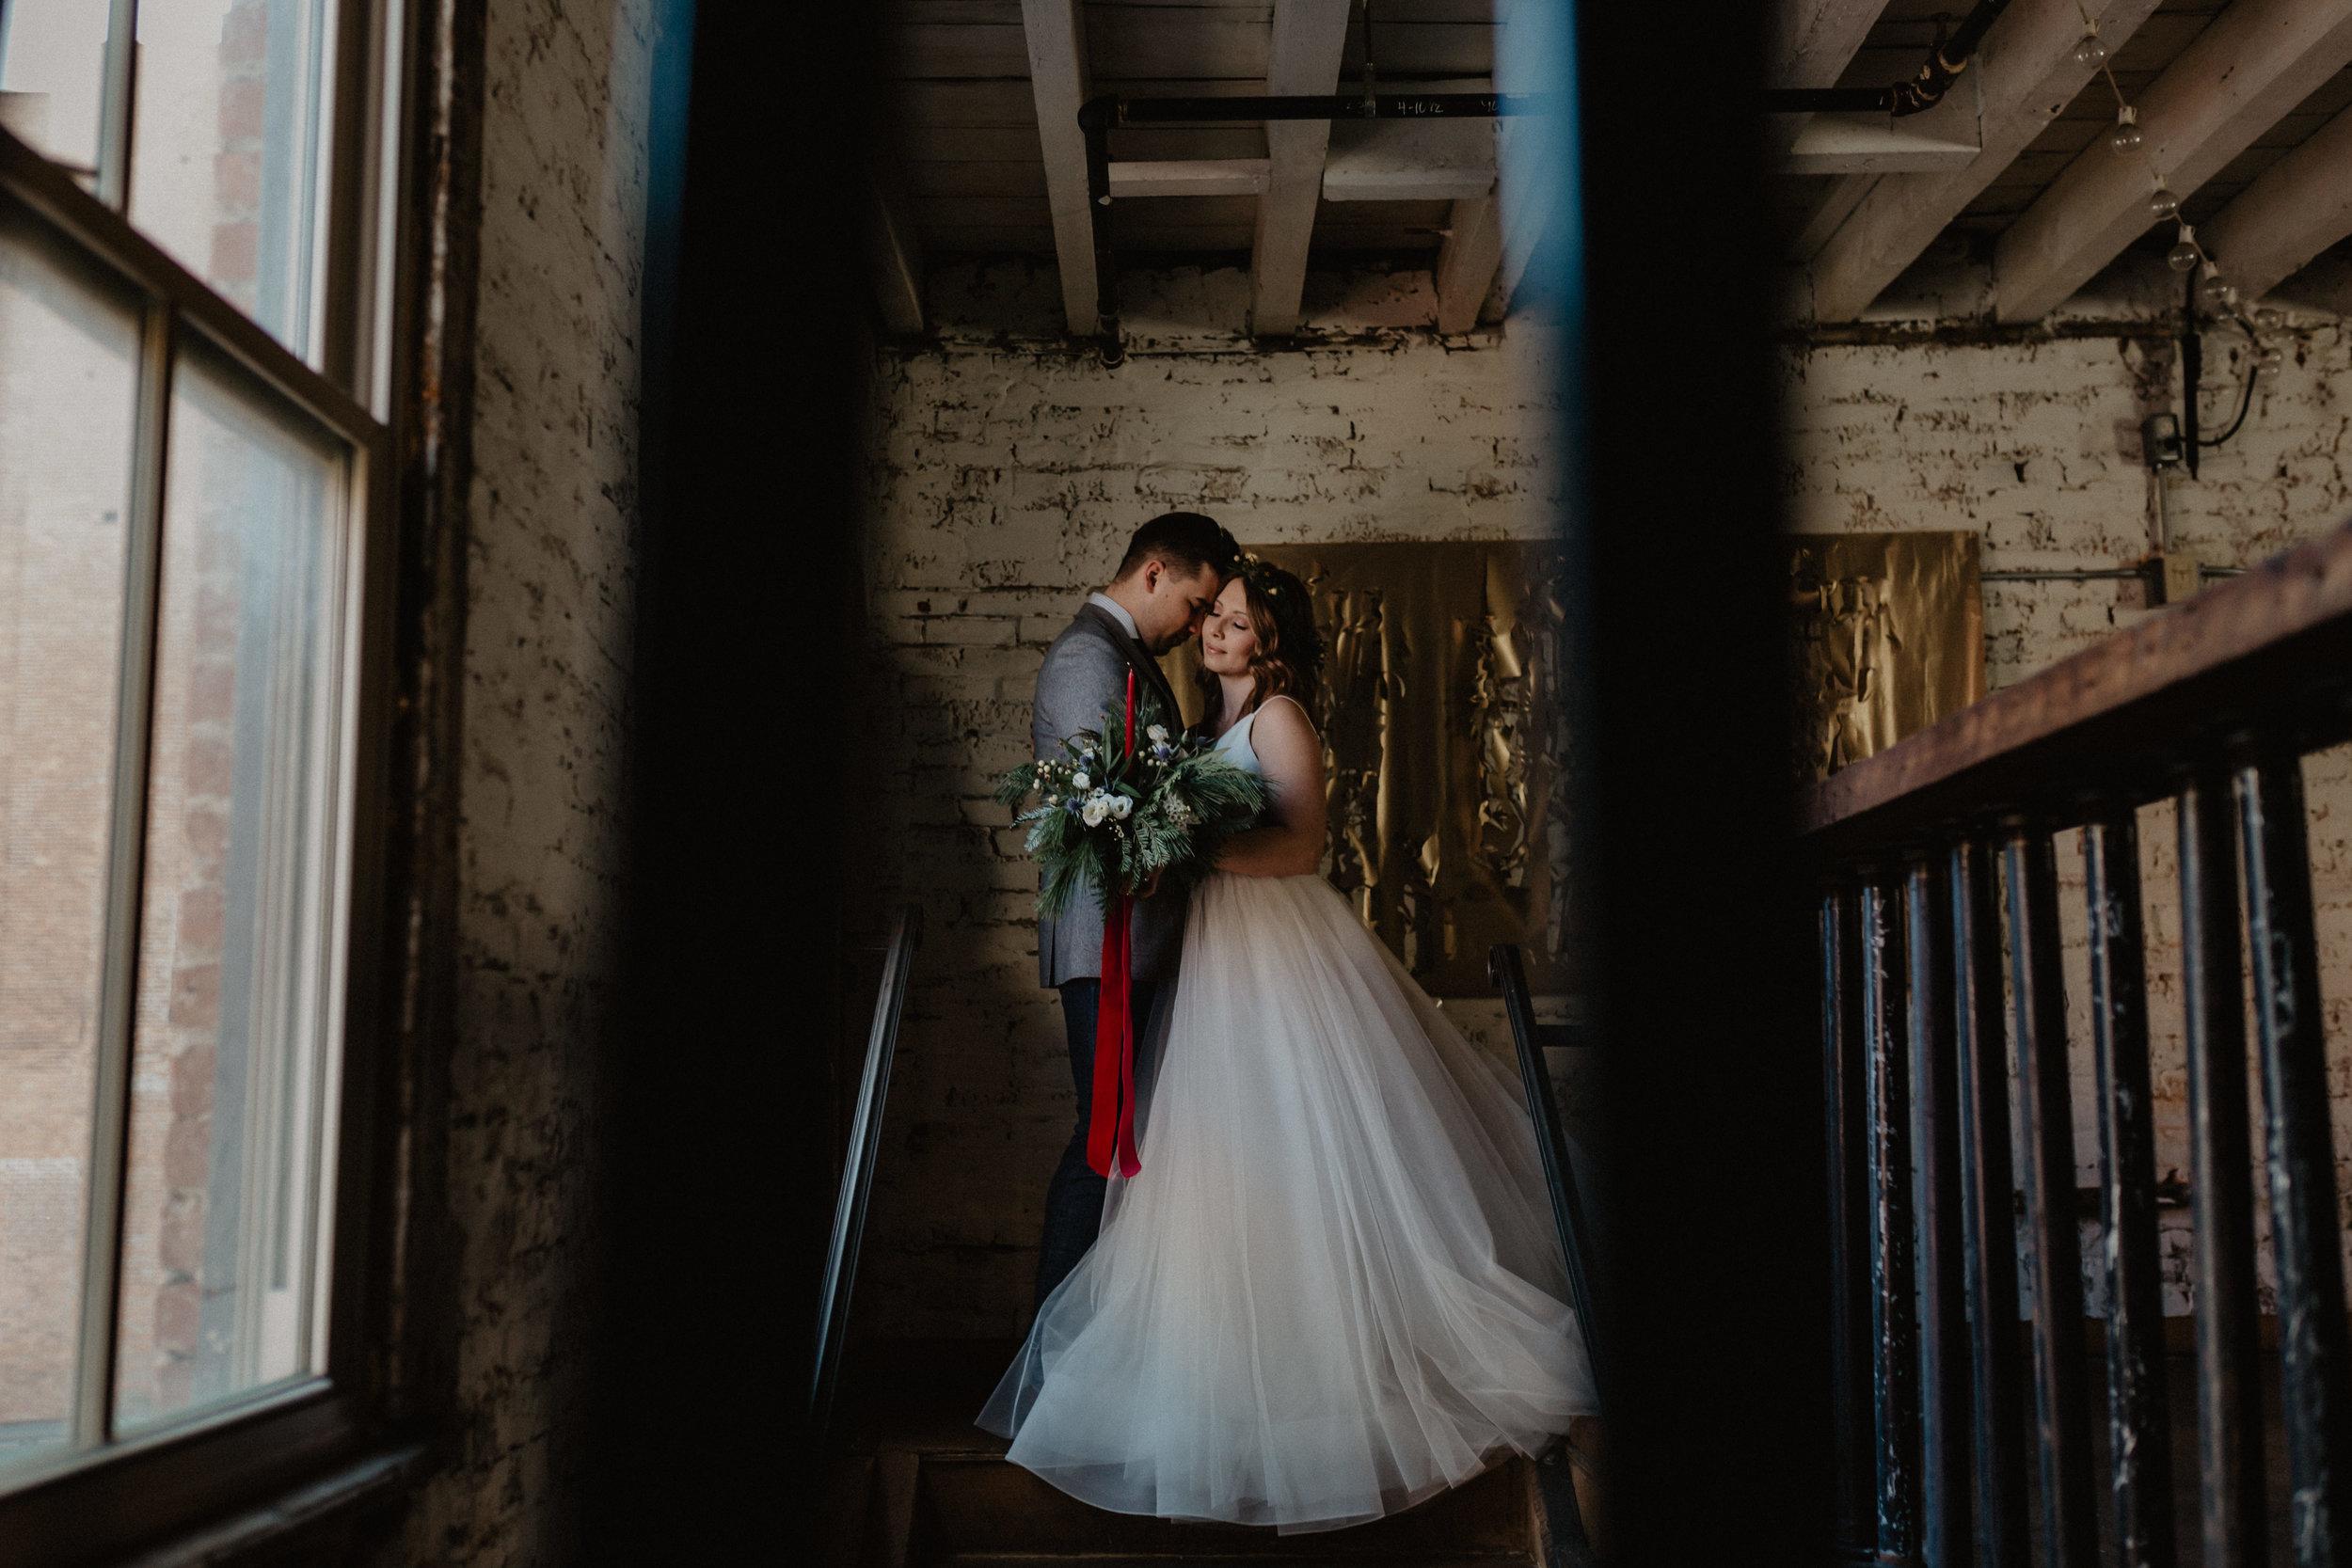 lucas_confectionery_wedding-20.jpg